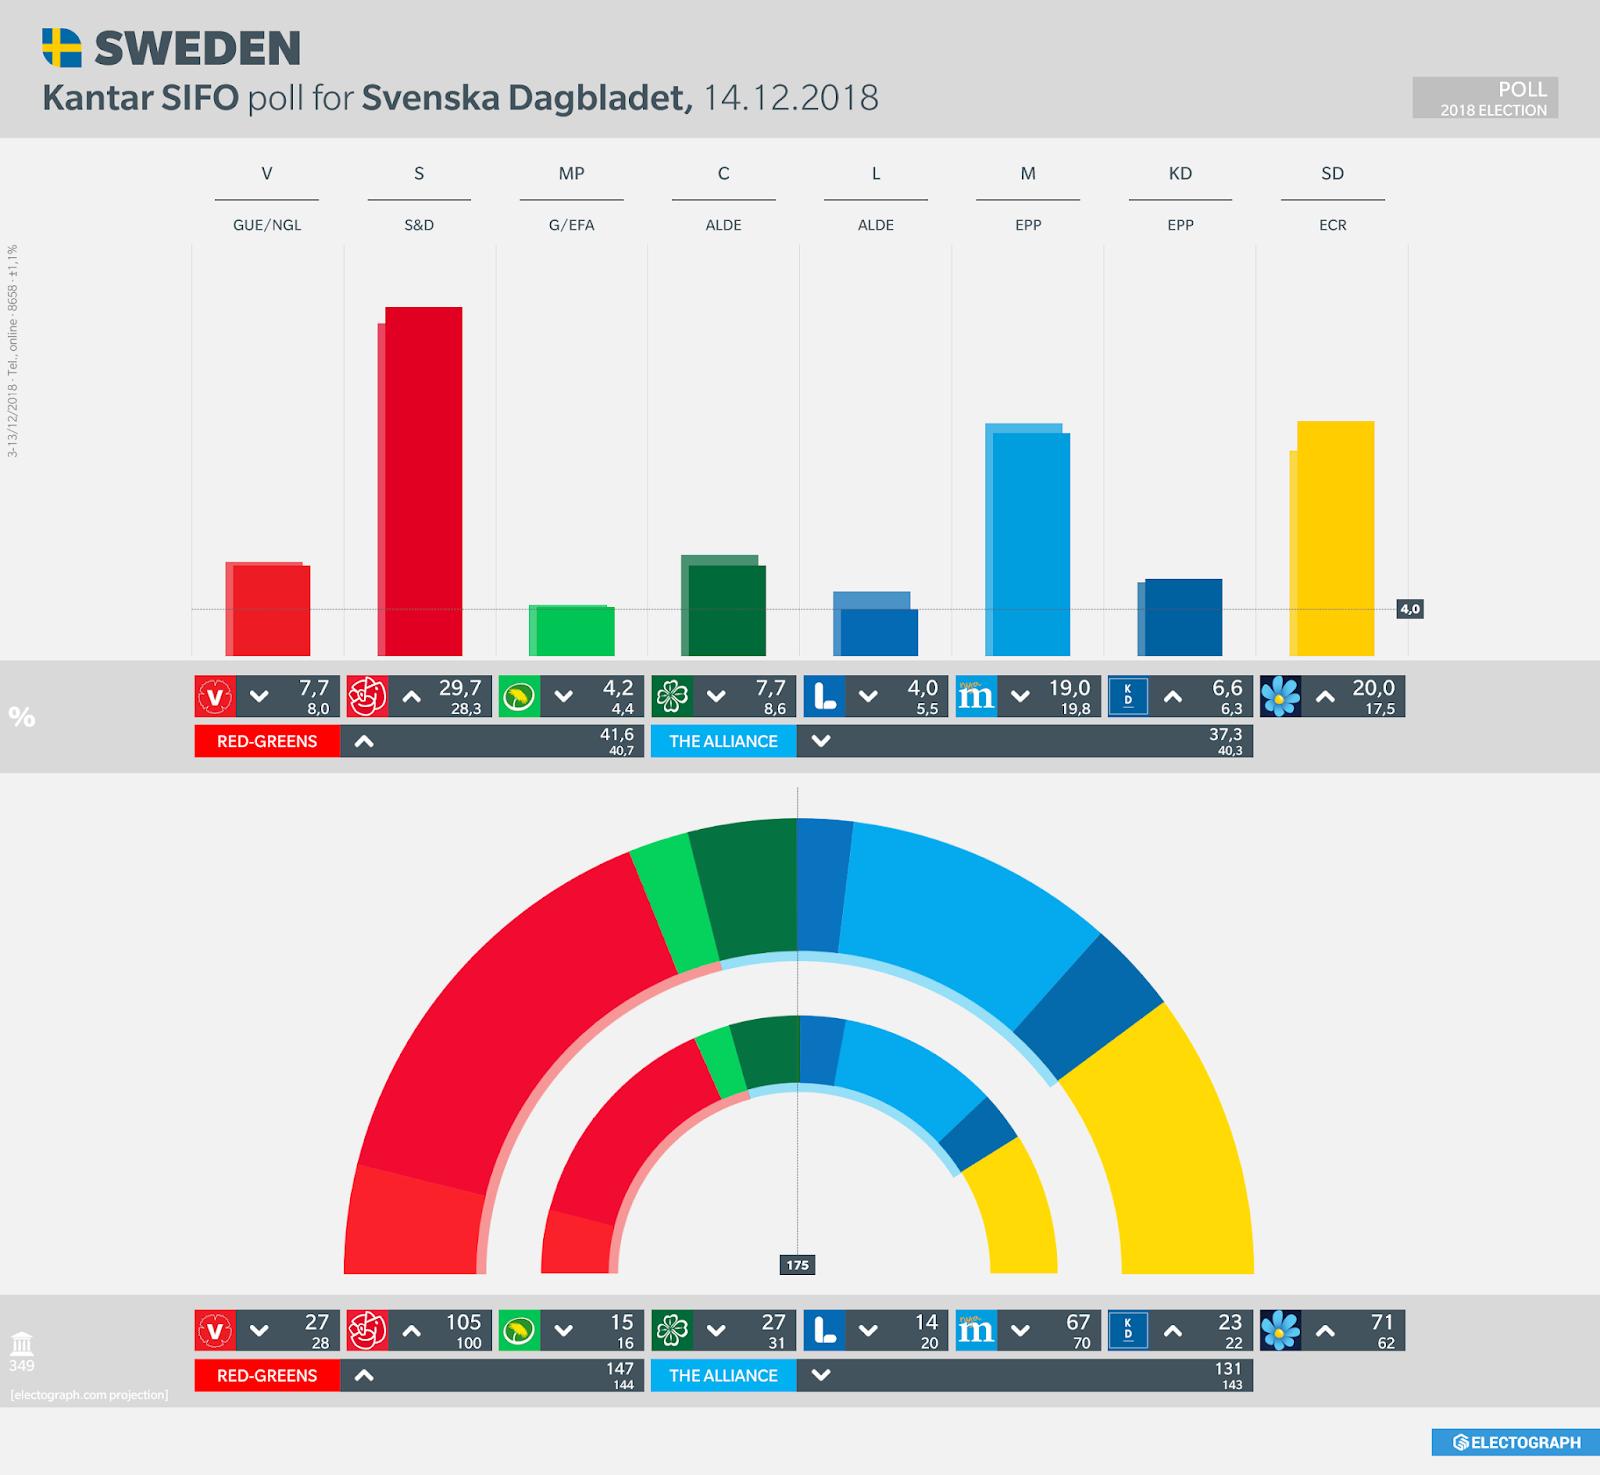 SWEDEN: Kantar SIFO poll chart for Svenska Dagbladet, 14 December 2018